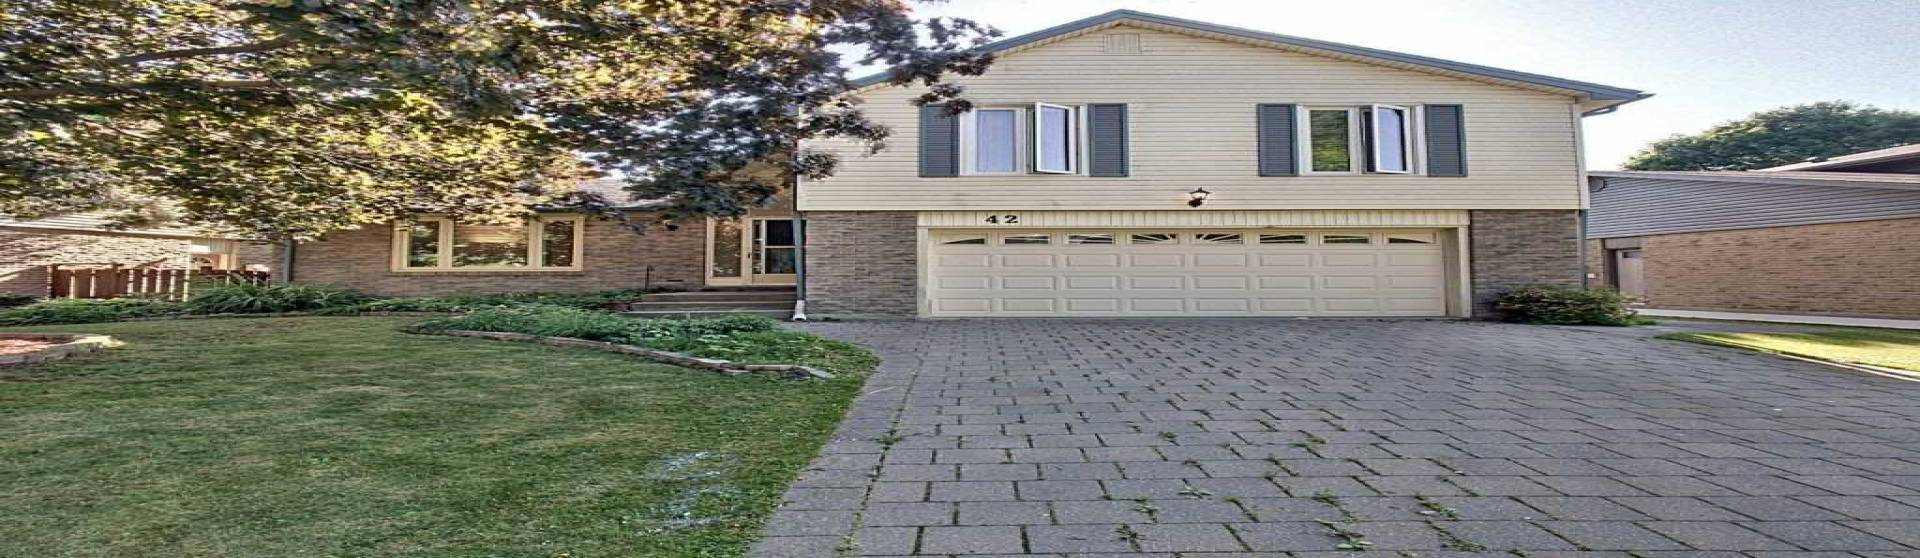 42 Four Oaks Cres, London, Ontario N6J4B7, 4 Bedrooms Bedrooms, 8 Rooms Rooms,3 BathroomsBathrooms,Detached,Sale,Four Oaks,X4812116